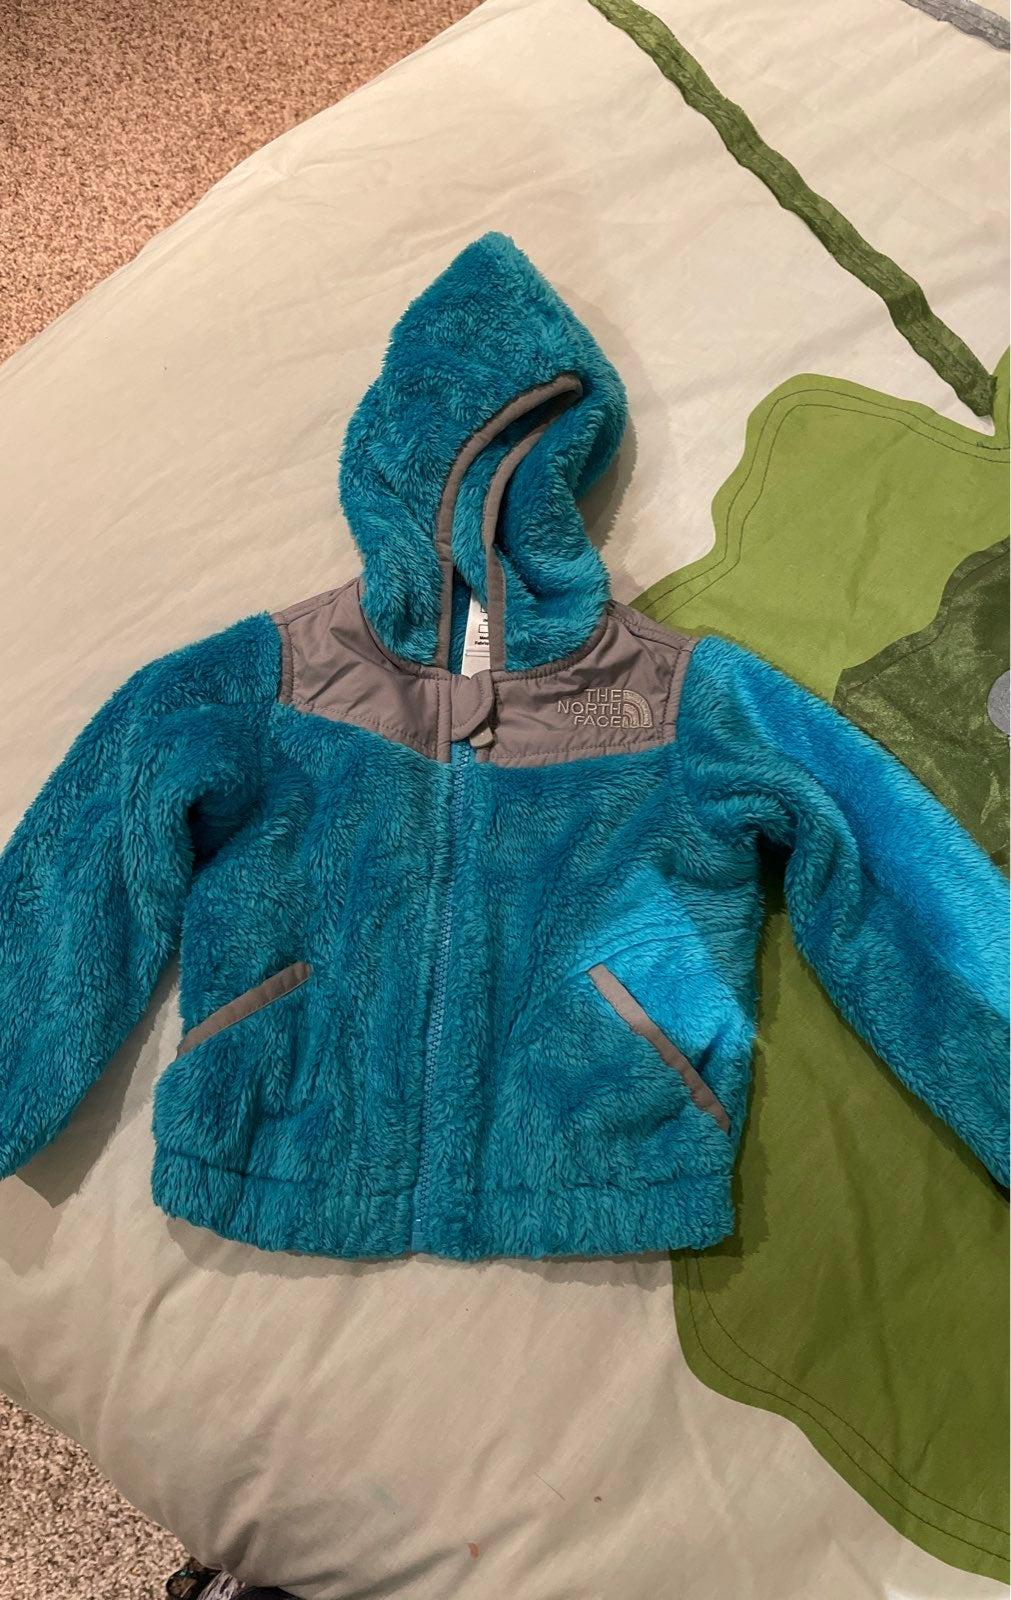 Northface jacket 6-12 months